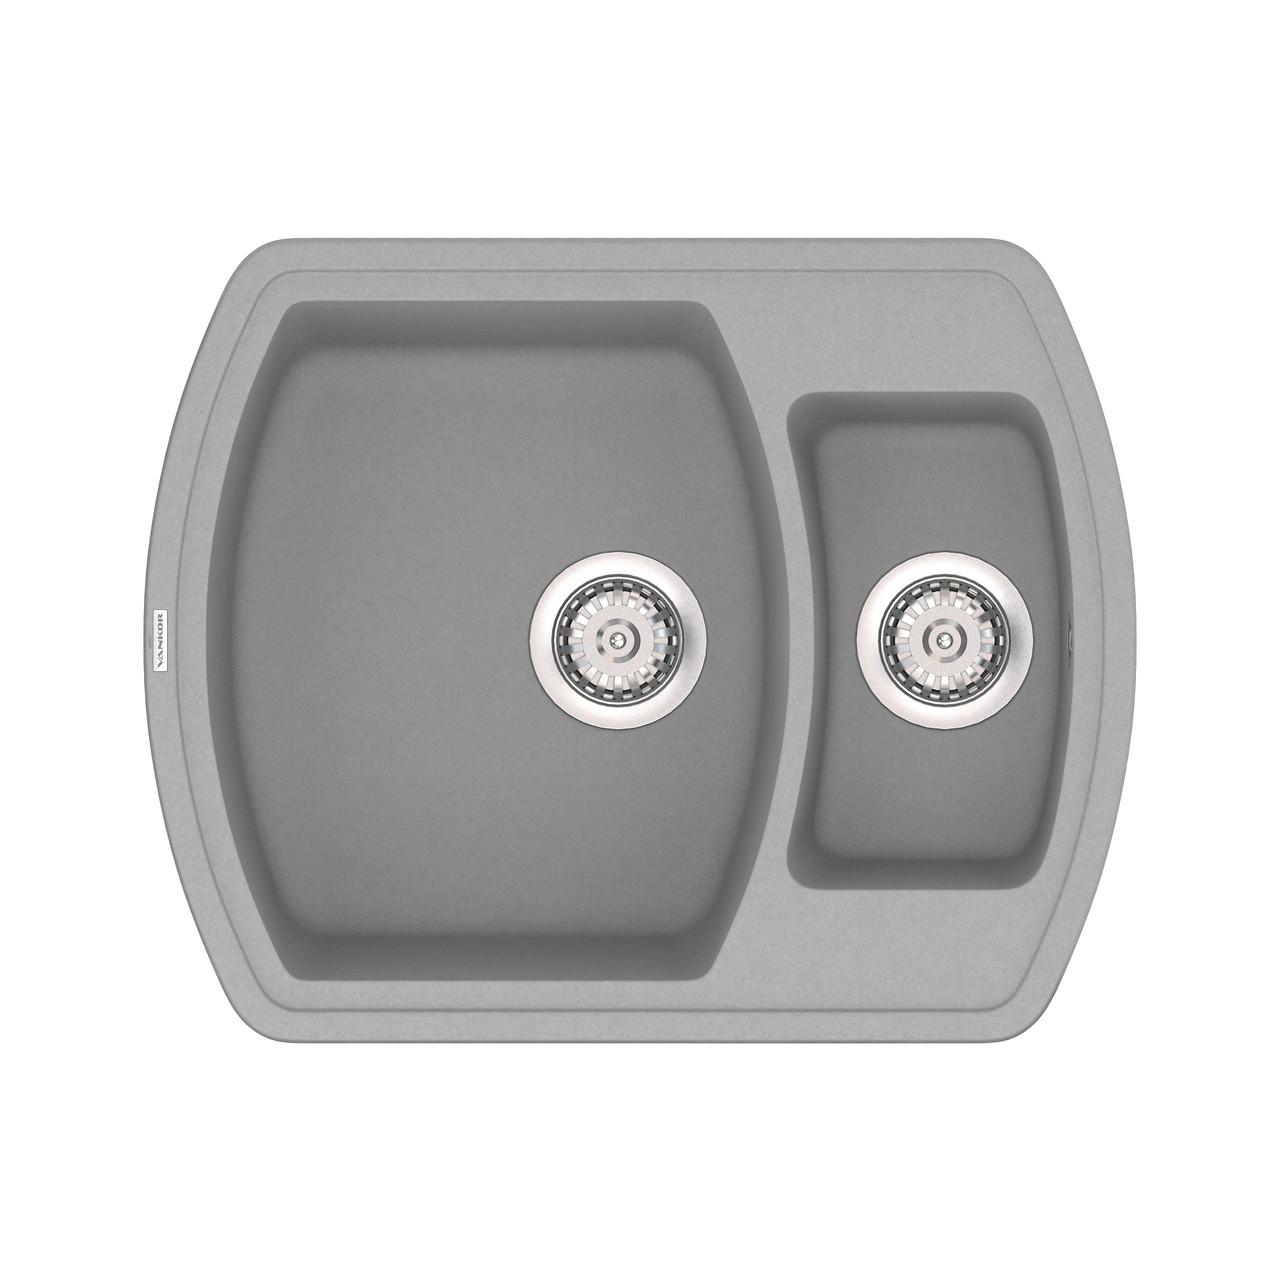 Кухонная мойка (кварц) VANKOR Norton NMP 03.63 6 цветов + сифон